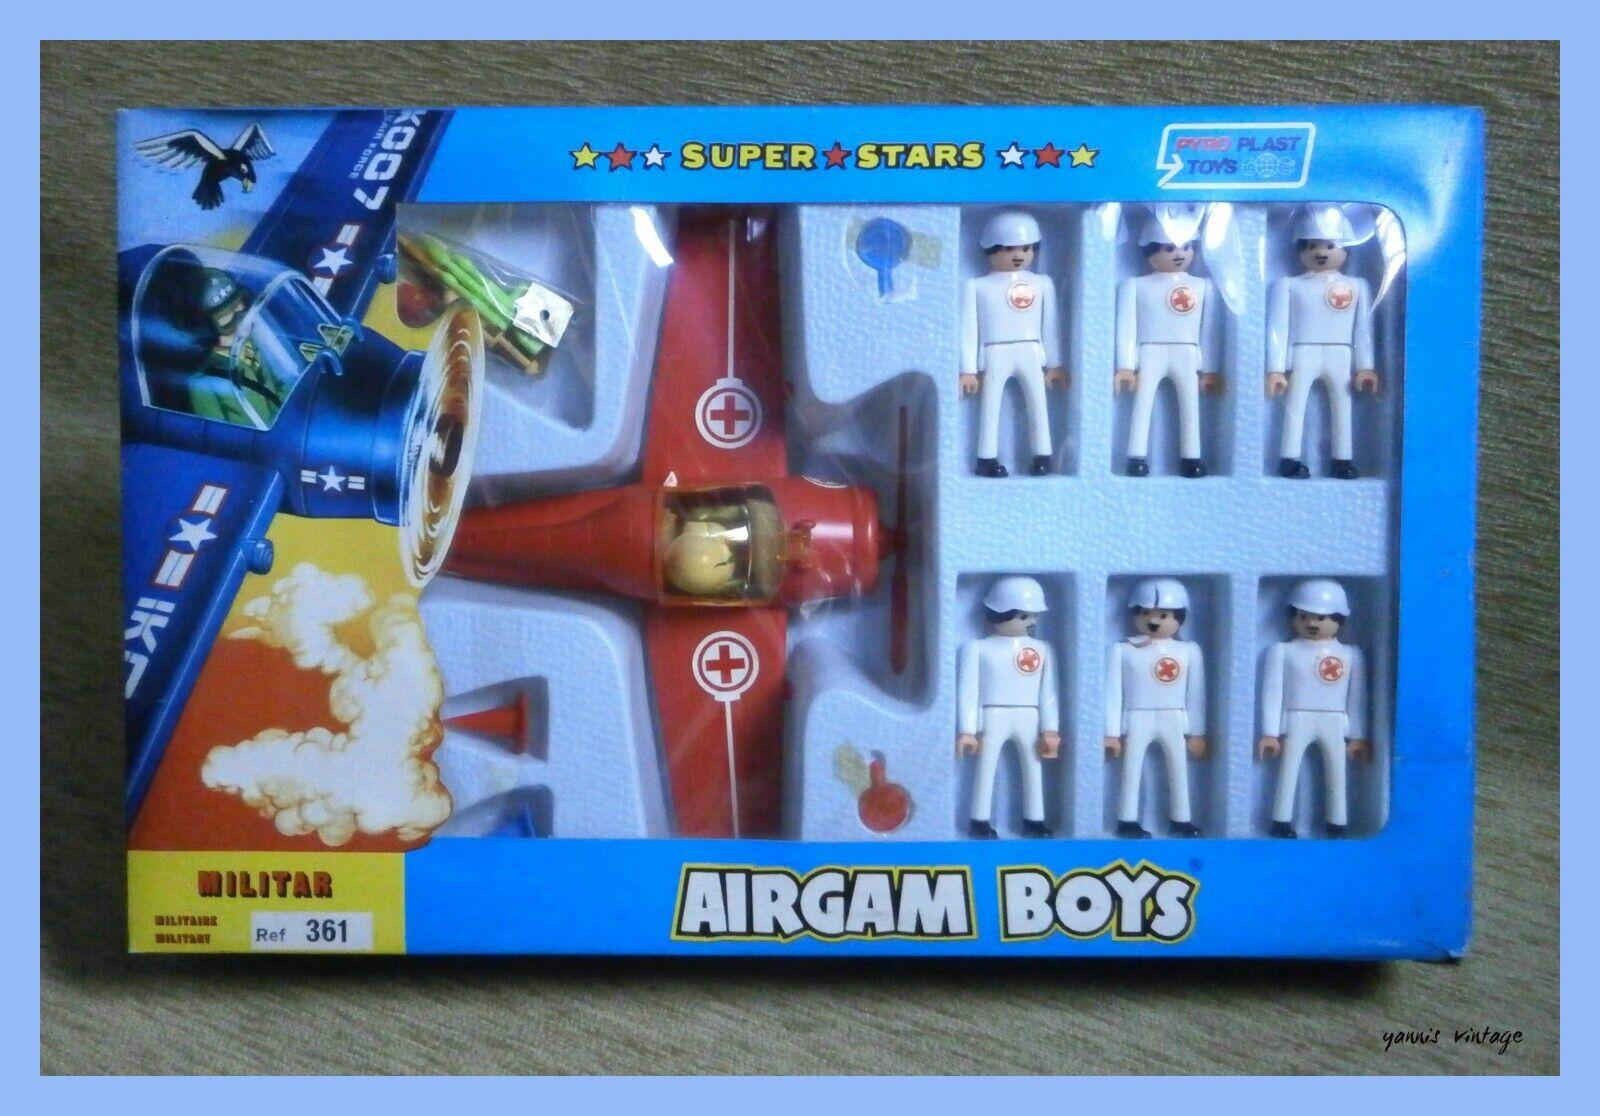 AIRGAM BOYS SUPER STARS Red Cross MILITARY NIB PYROPLAST TOYS Greece Greek VTG